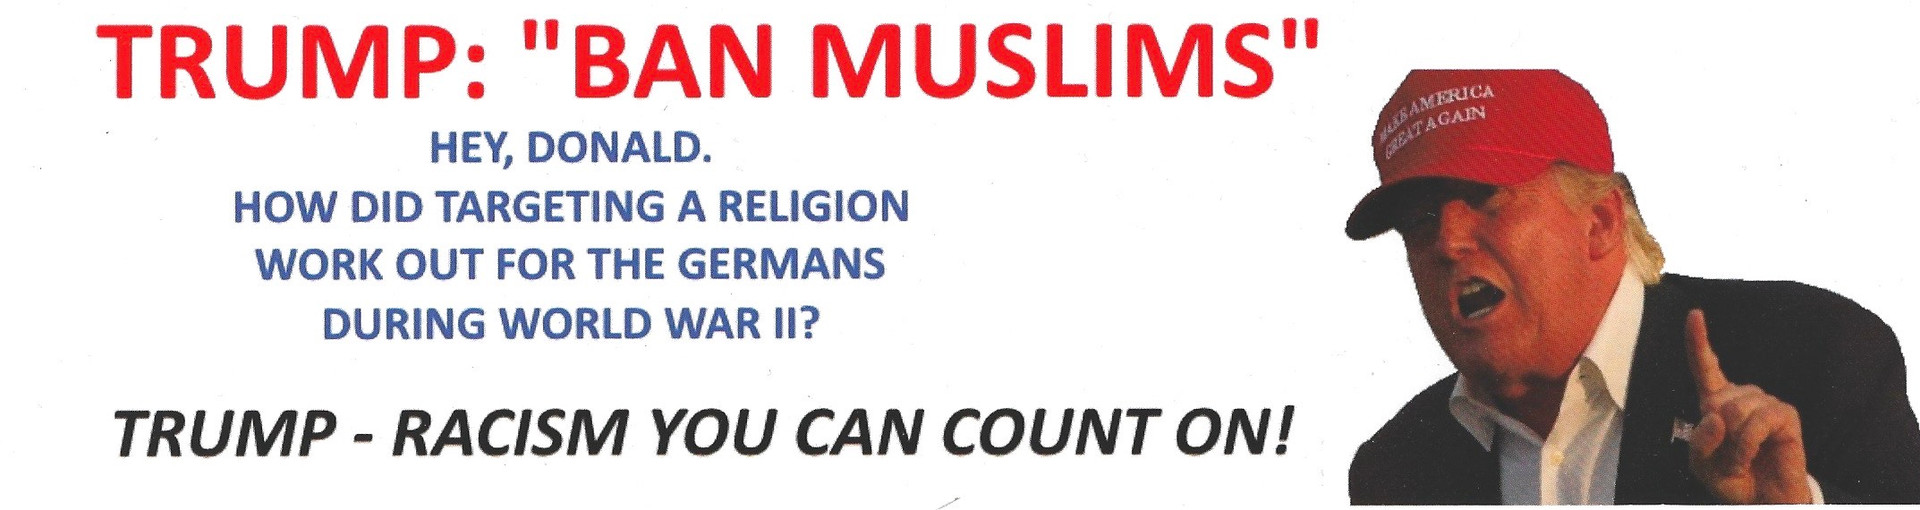 Trump Ban Muslims